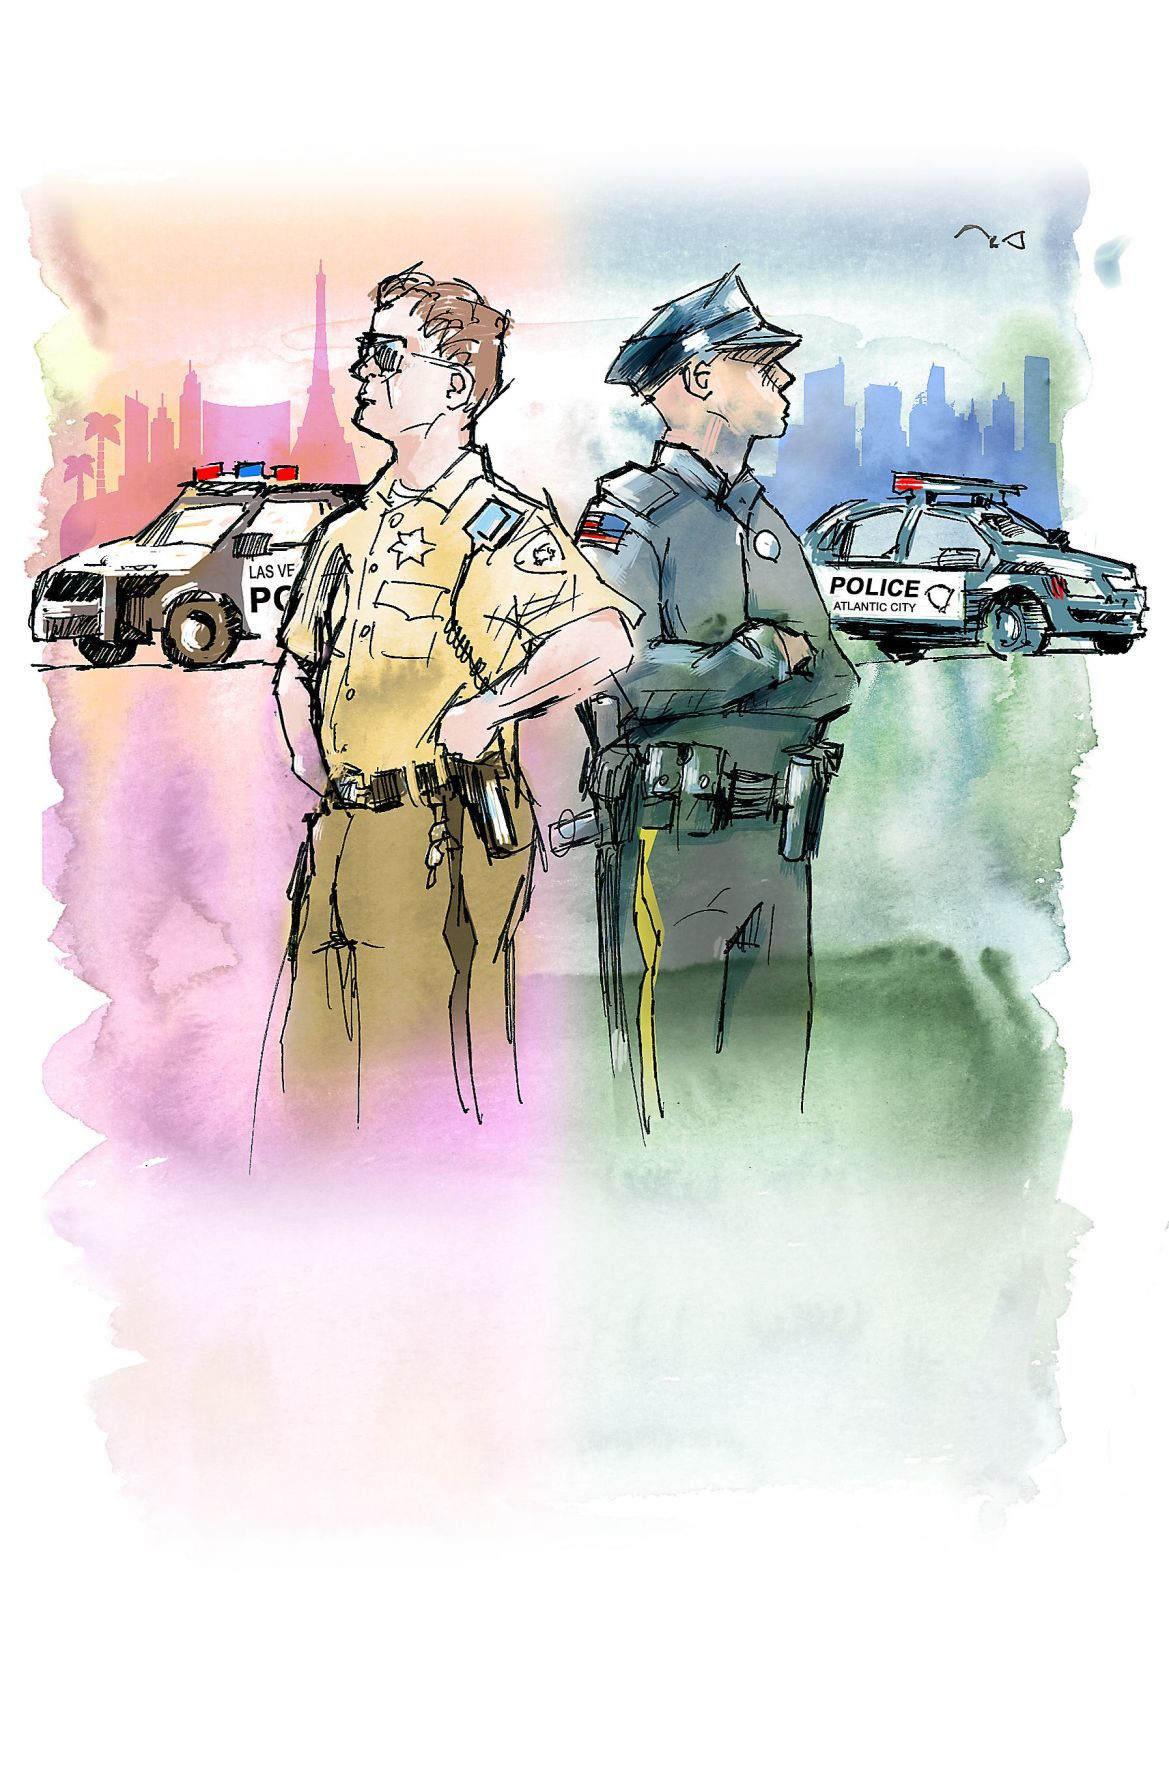 Vegas/AC police